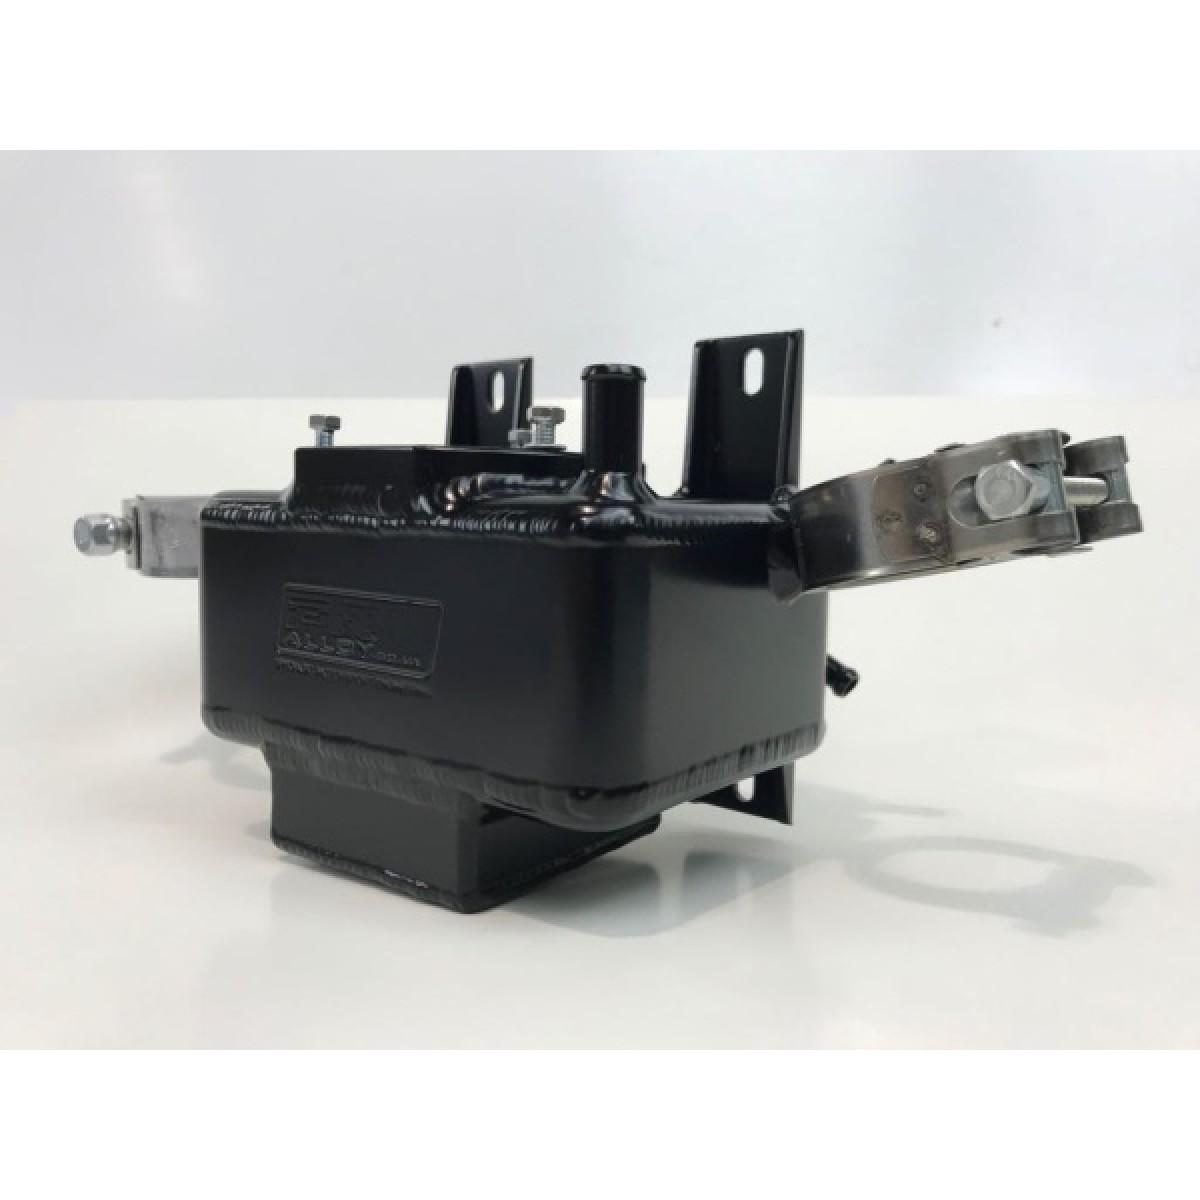 Vw Golf Mk2 Gti Fuel Pump Housing 60mm Dub Parts Online Shop More Views